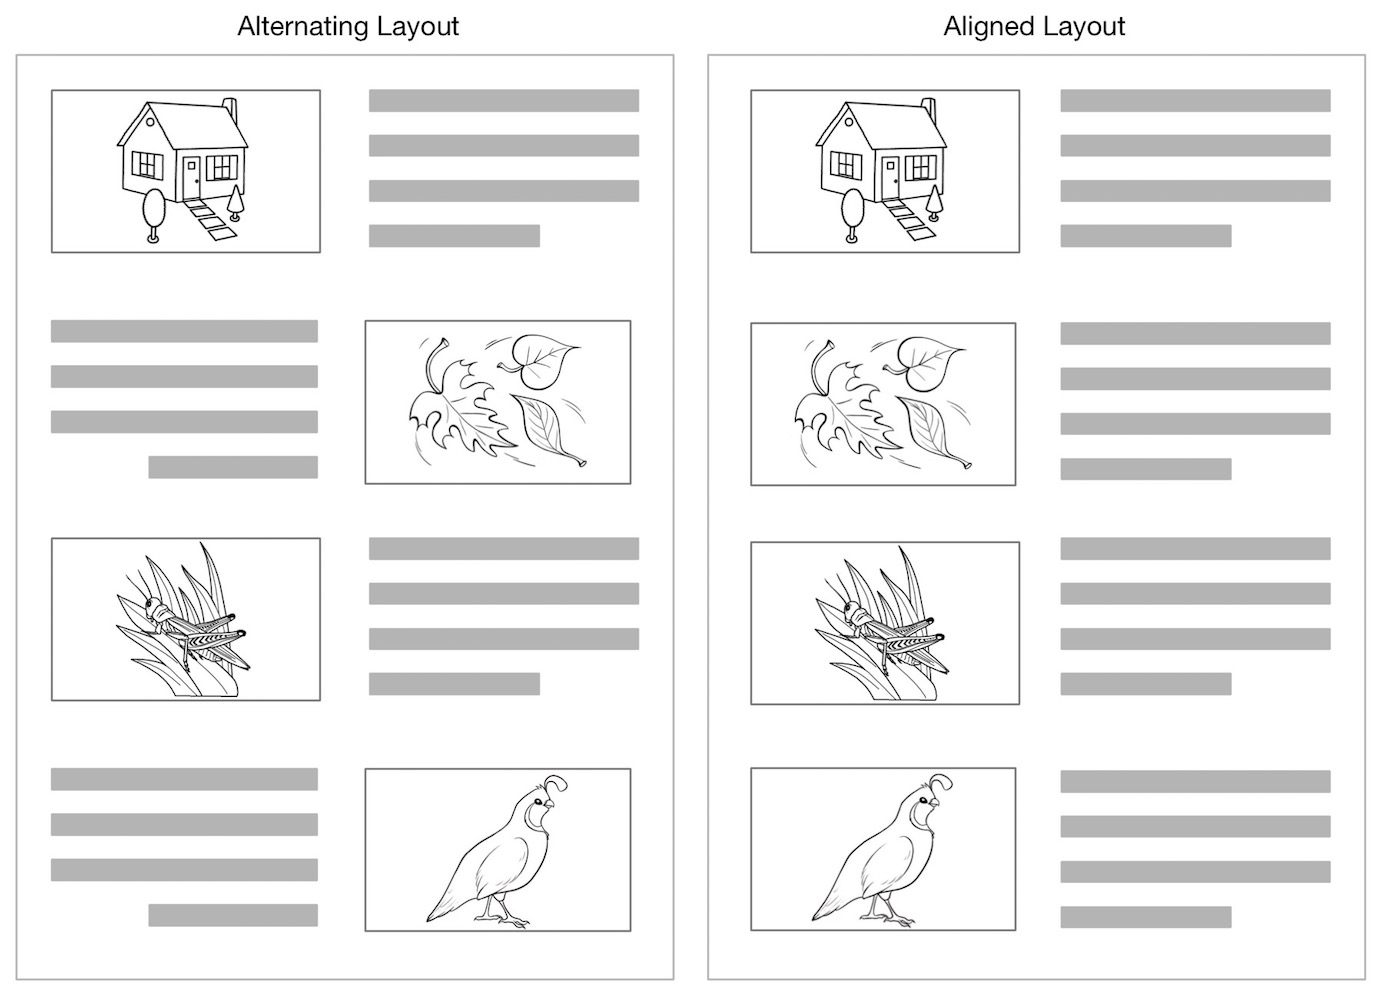 Zigzag Image Text Layouts Make Scanning Less Efficient